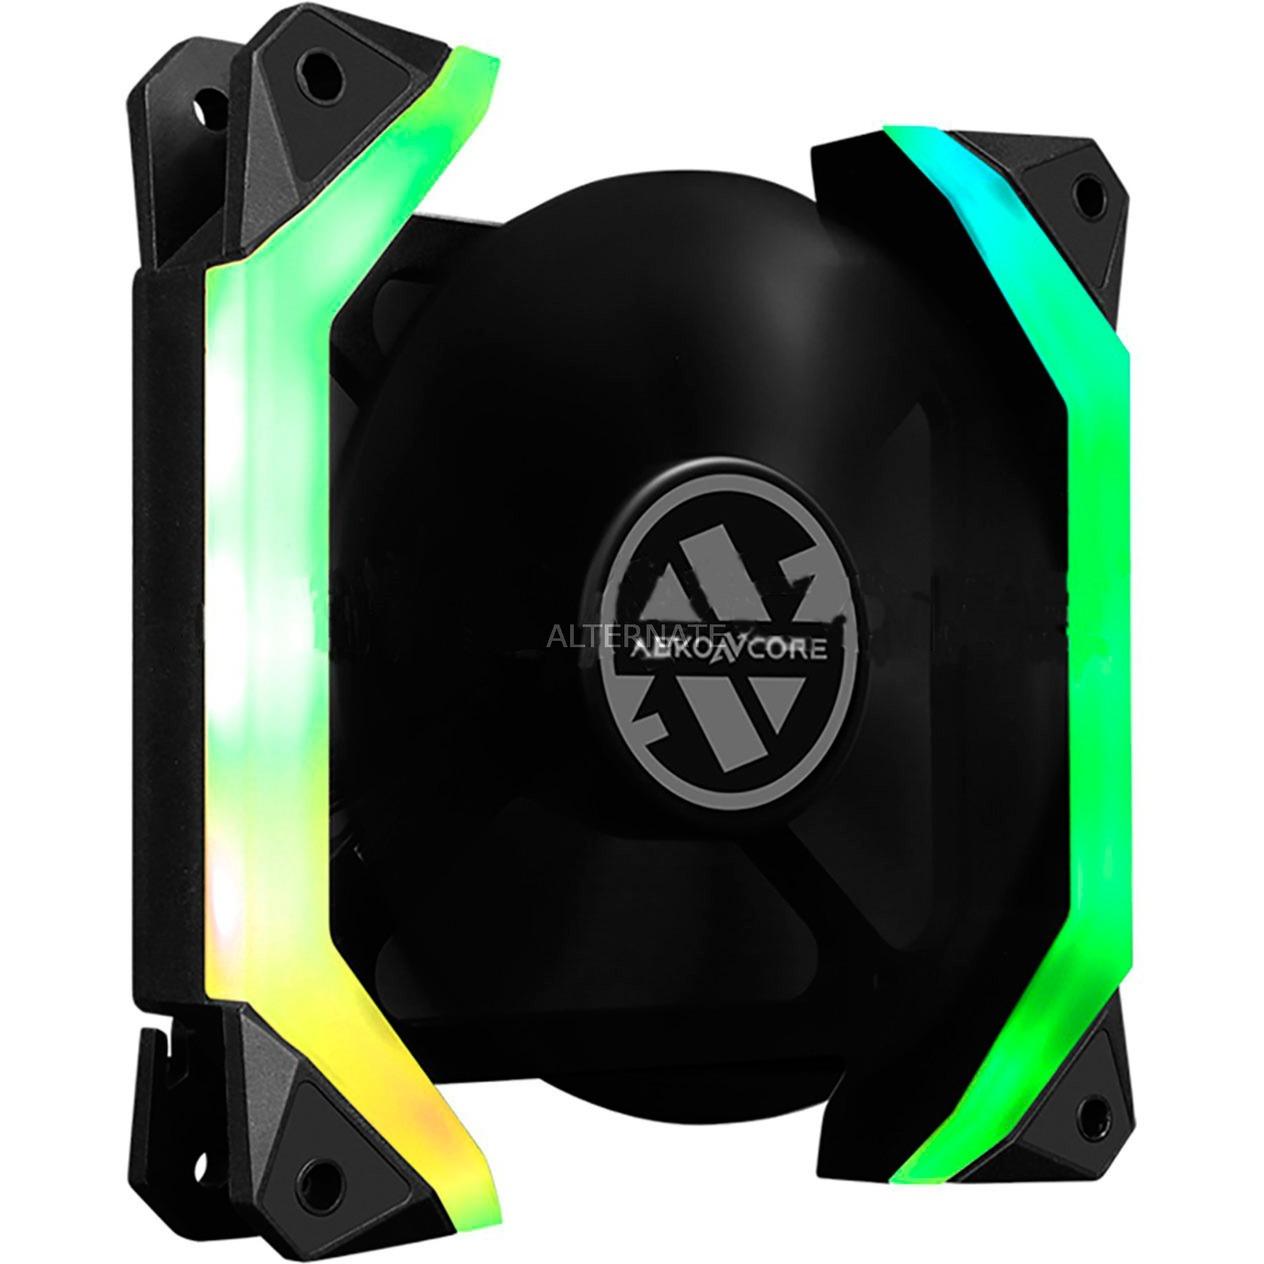 Spider Spectrum Fan, Ventilador